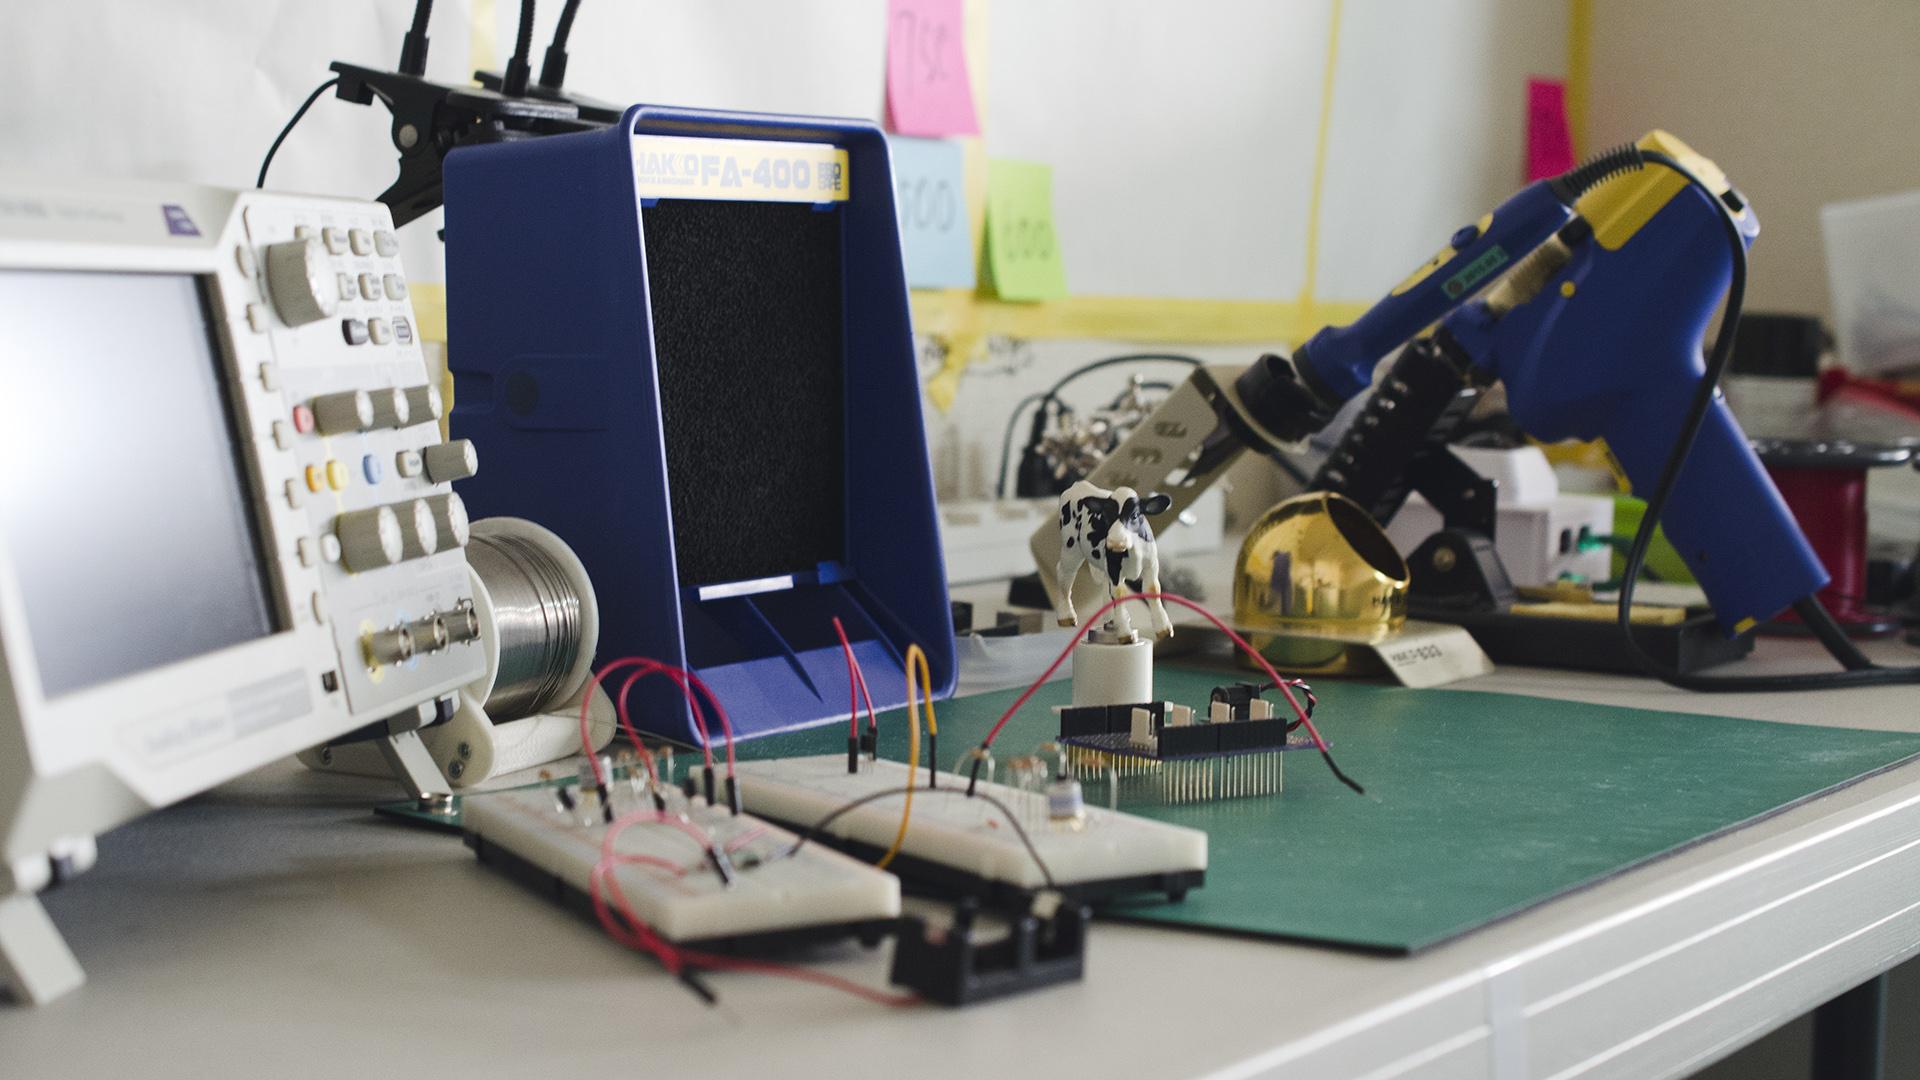 Isaax Camp - Raspberry Pi (ラズパイ) , AI , IoTについて学べるメディア